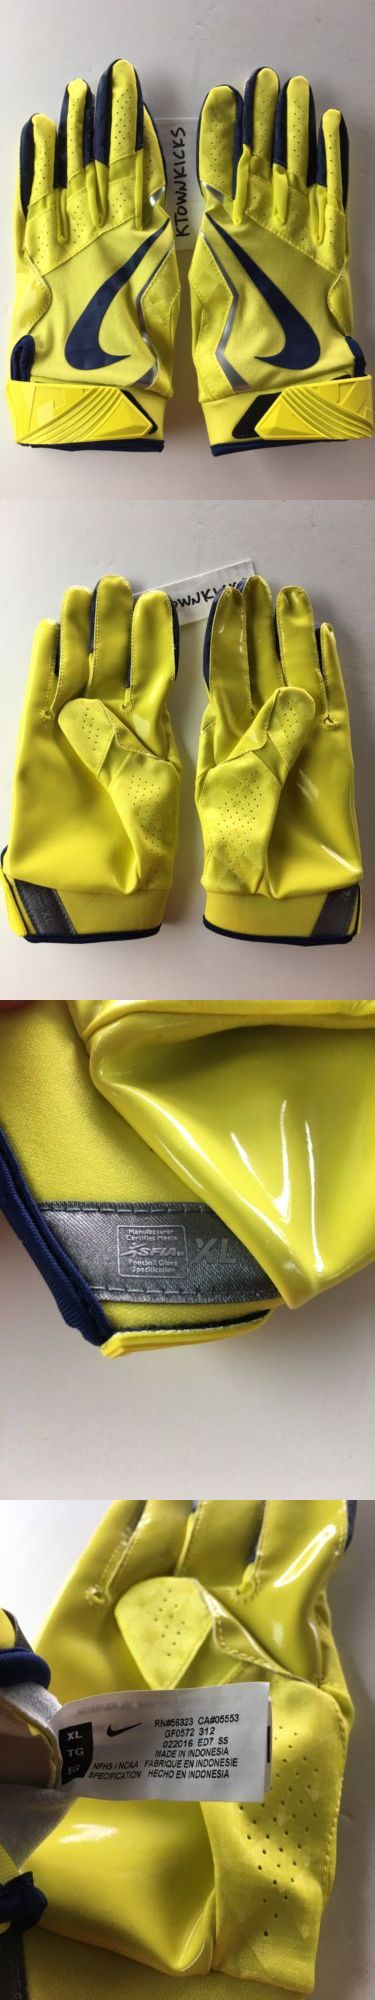 Gloves 159114: Nike Vapor Jet 4 Football Receiver Gloves Yellow Grey Gf0572 312 Men S Xl -> BUY IT NOW ONLY: $32.39 on eBay!